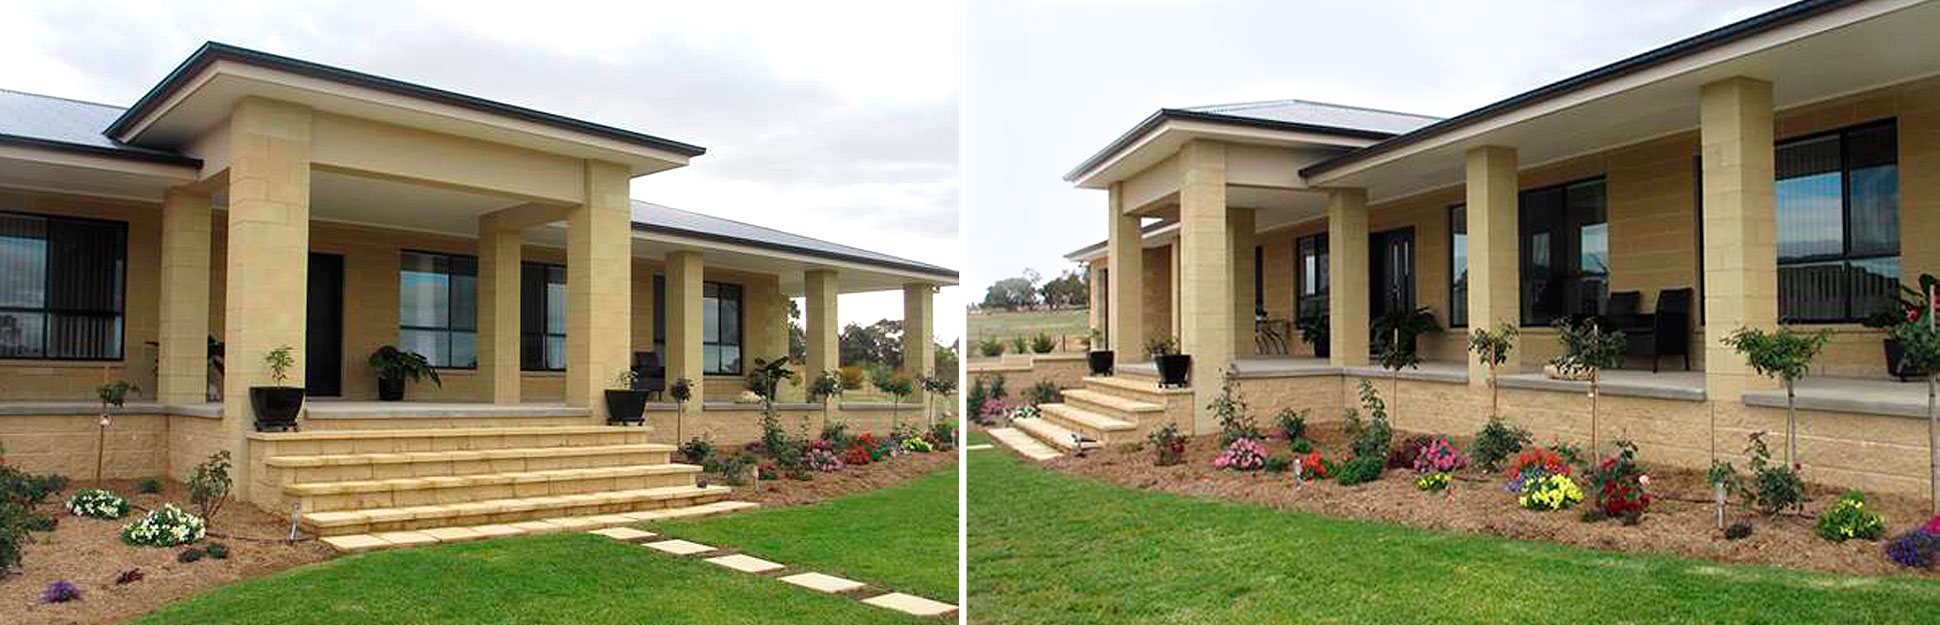 cowra concrete products masonry block residence